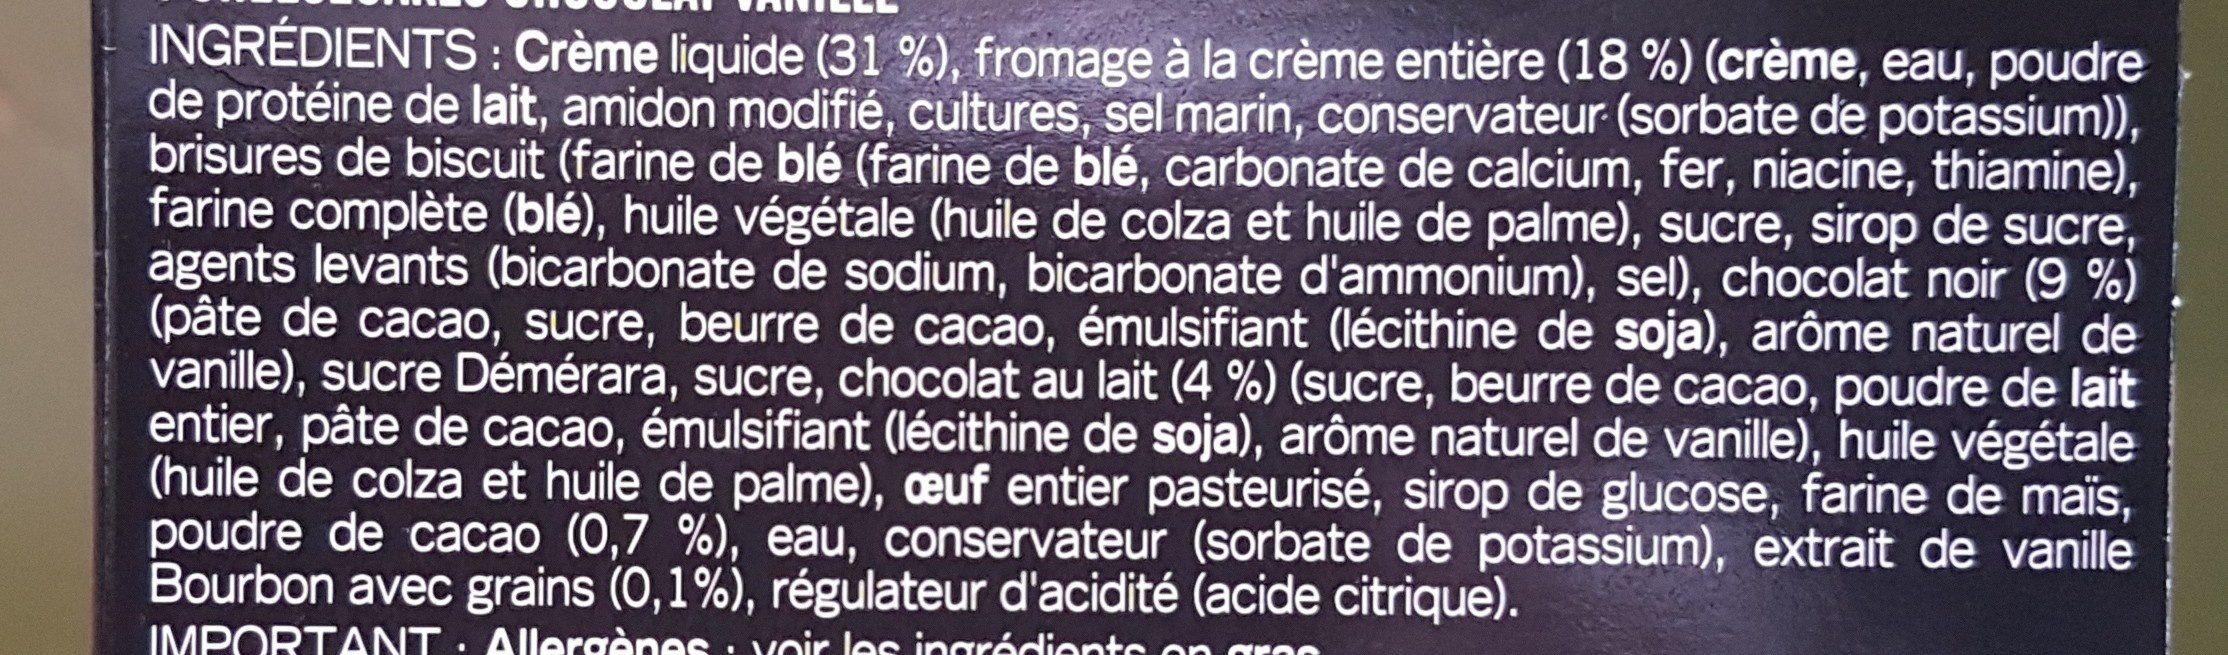 4 cheesecakes au chocolat & vanille de madagascar - Ingrediënten - fr